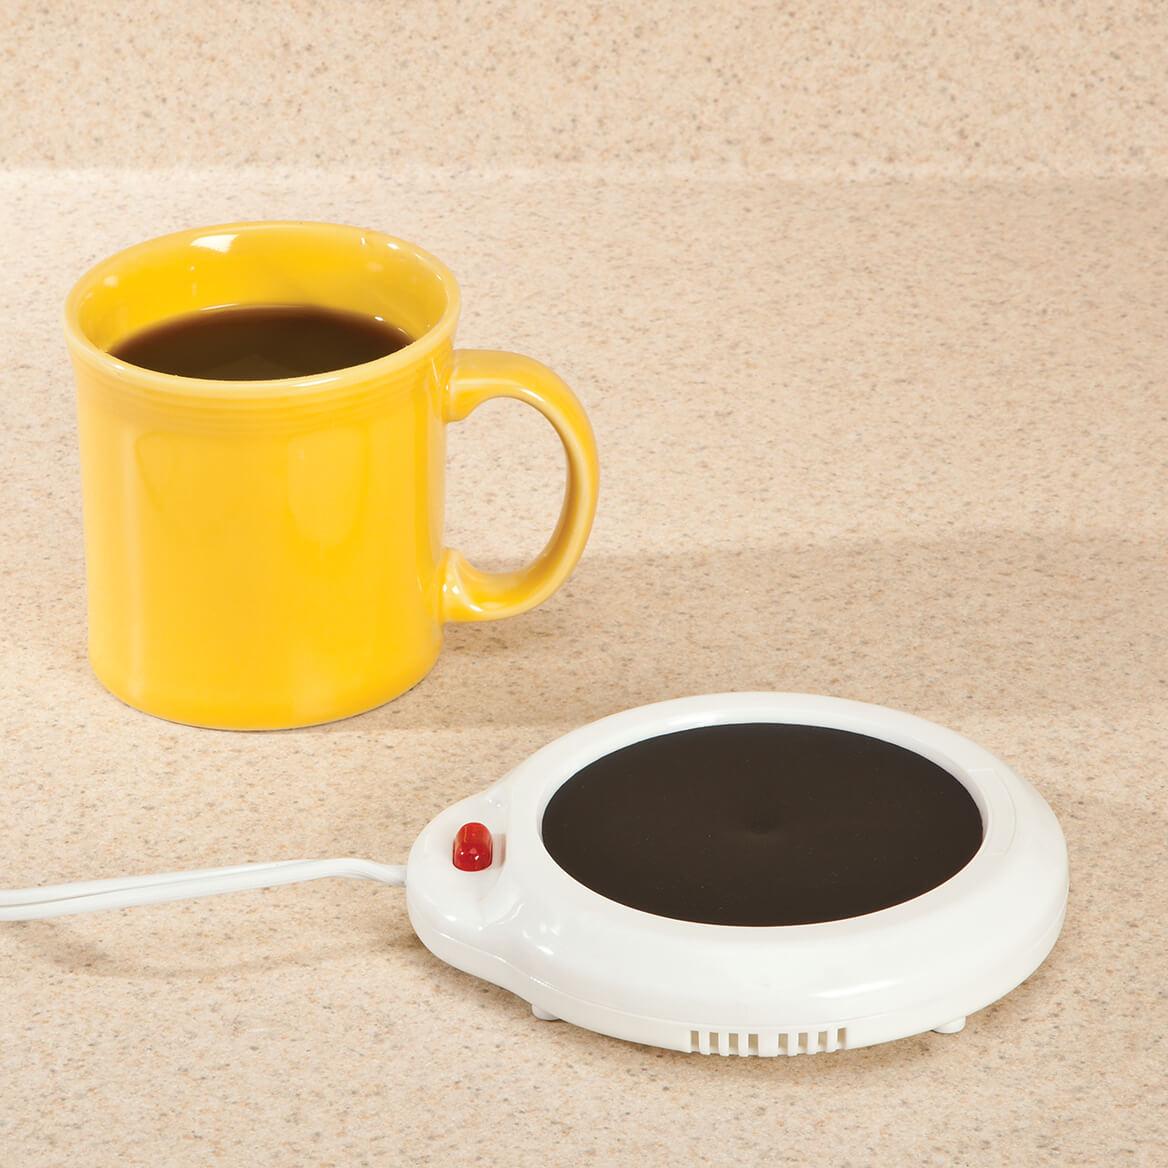 Coffee & Tea Accessories - Miles Kimball